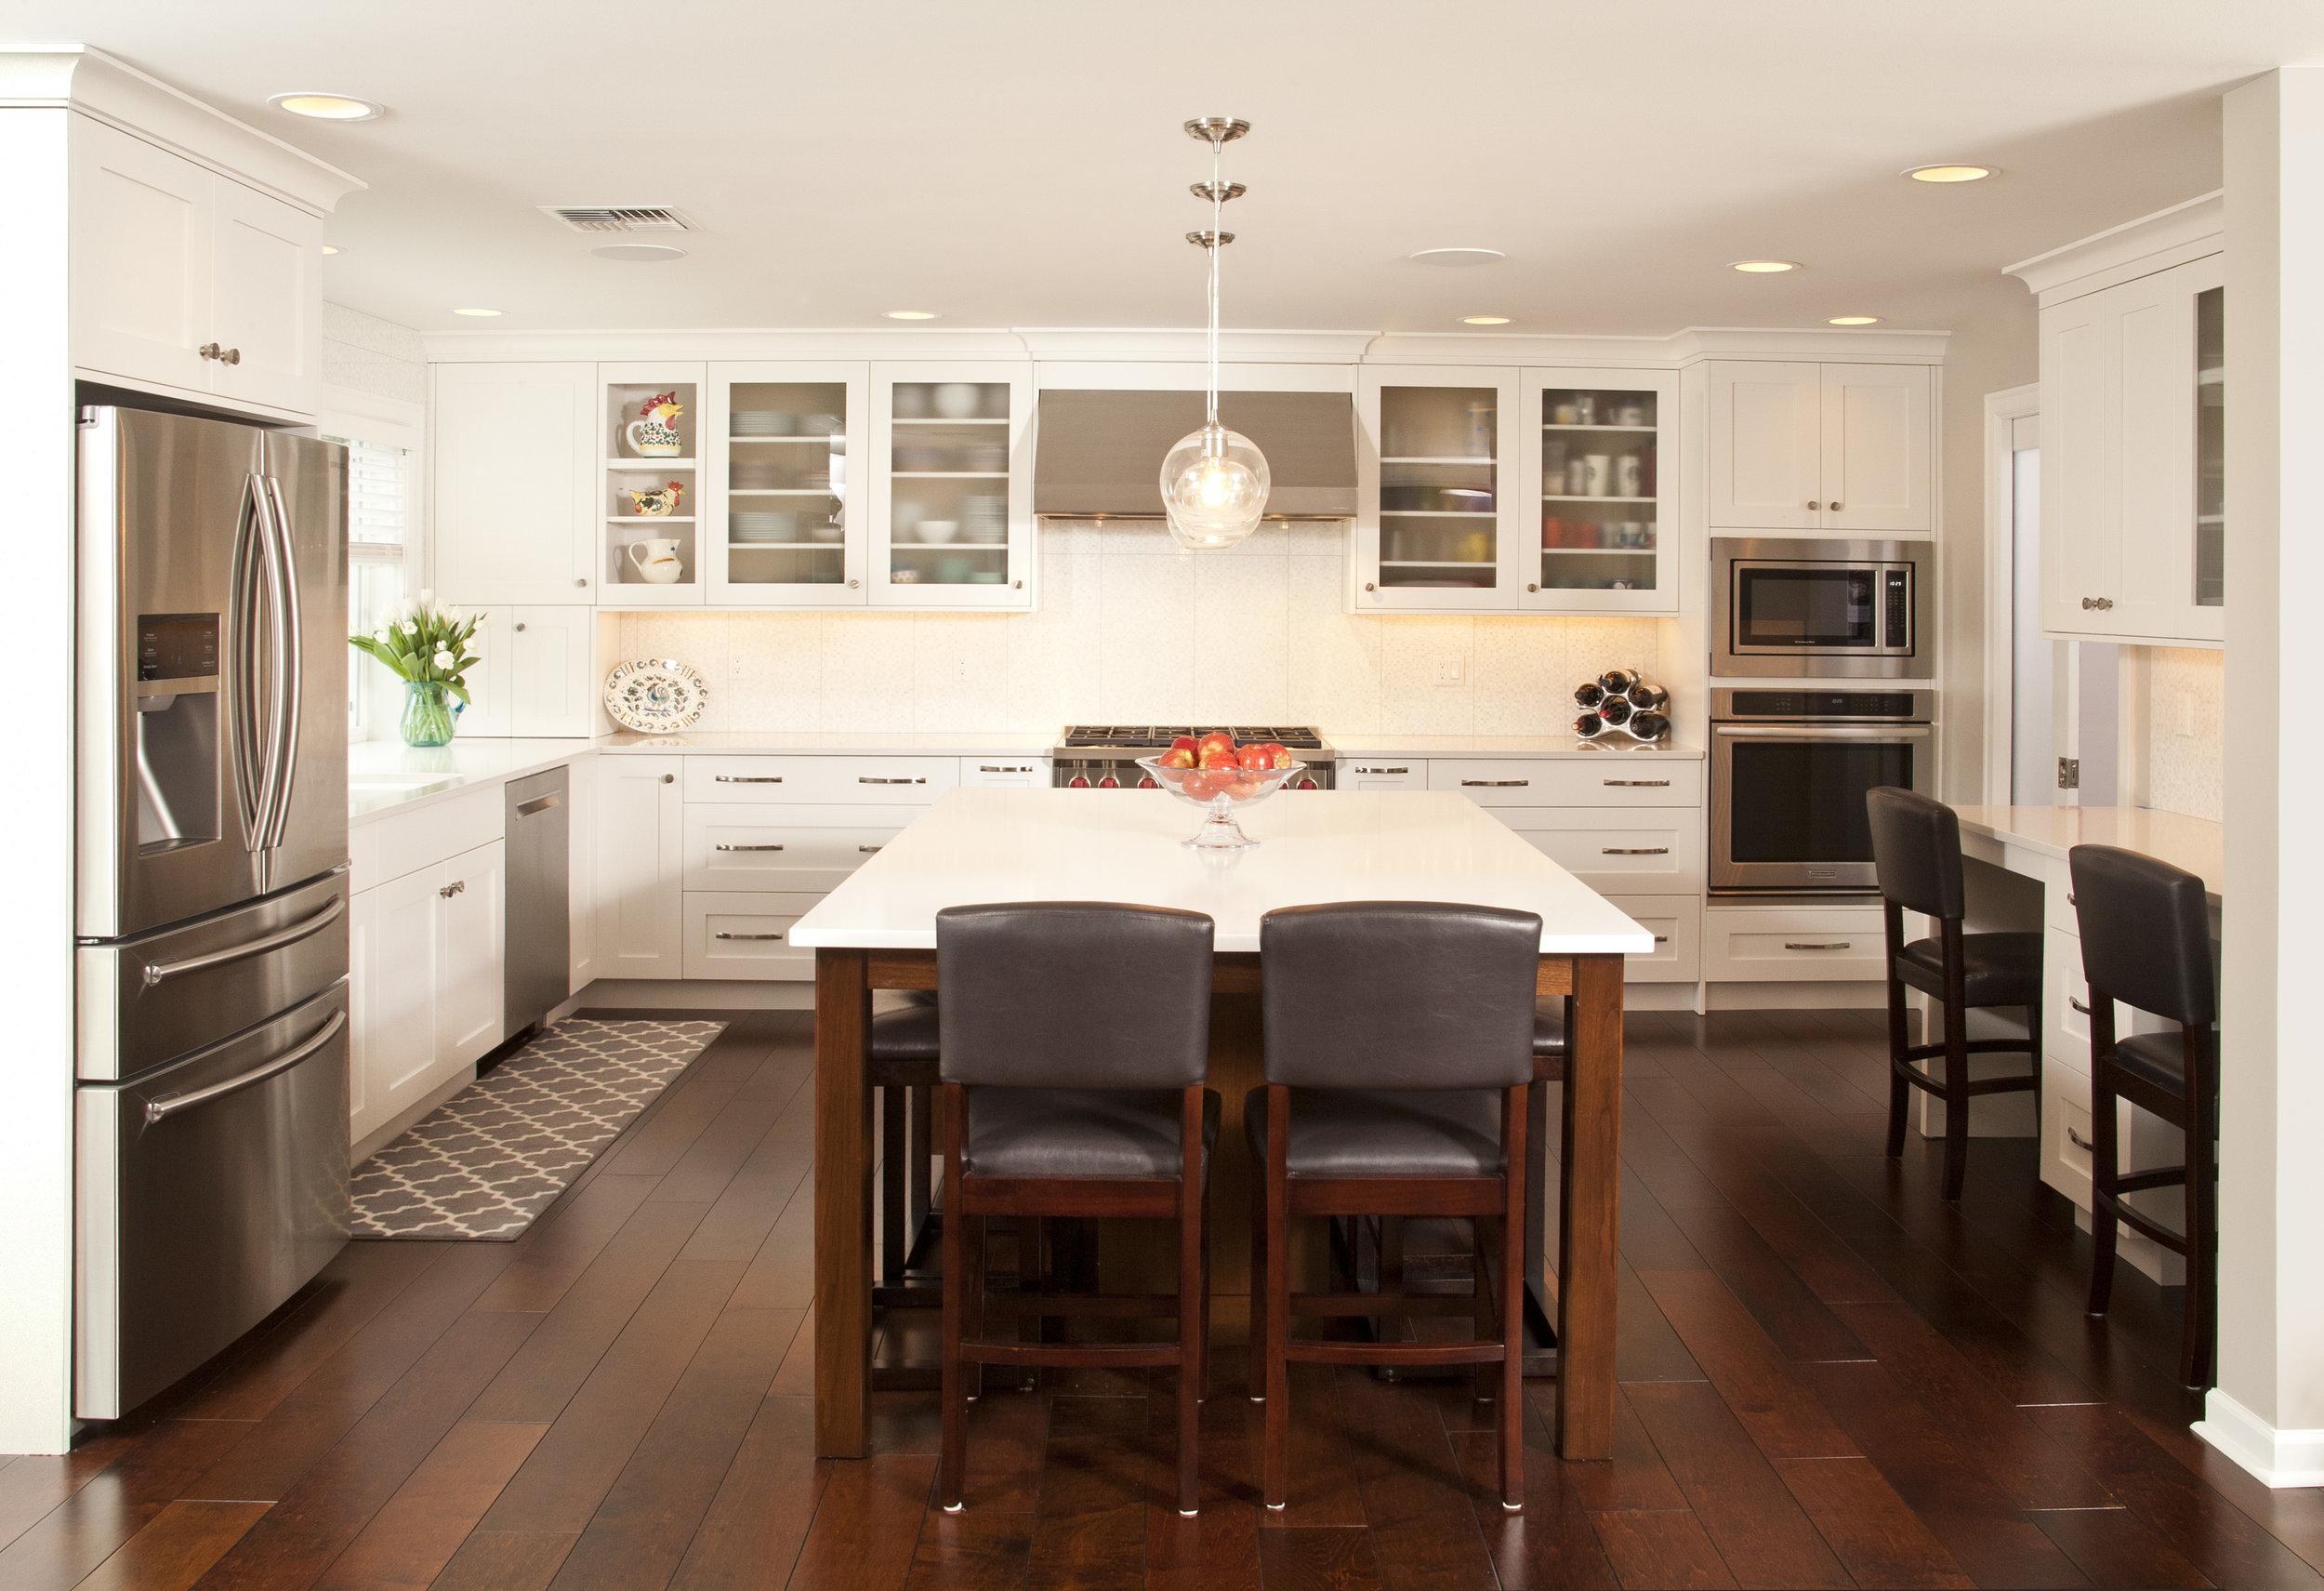 Bellevue Newport Shores Transitional Kitchen 2.jpg